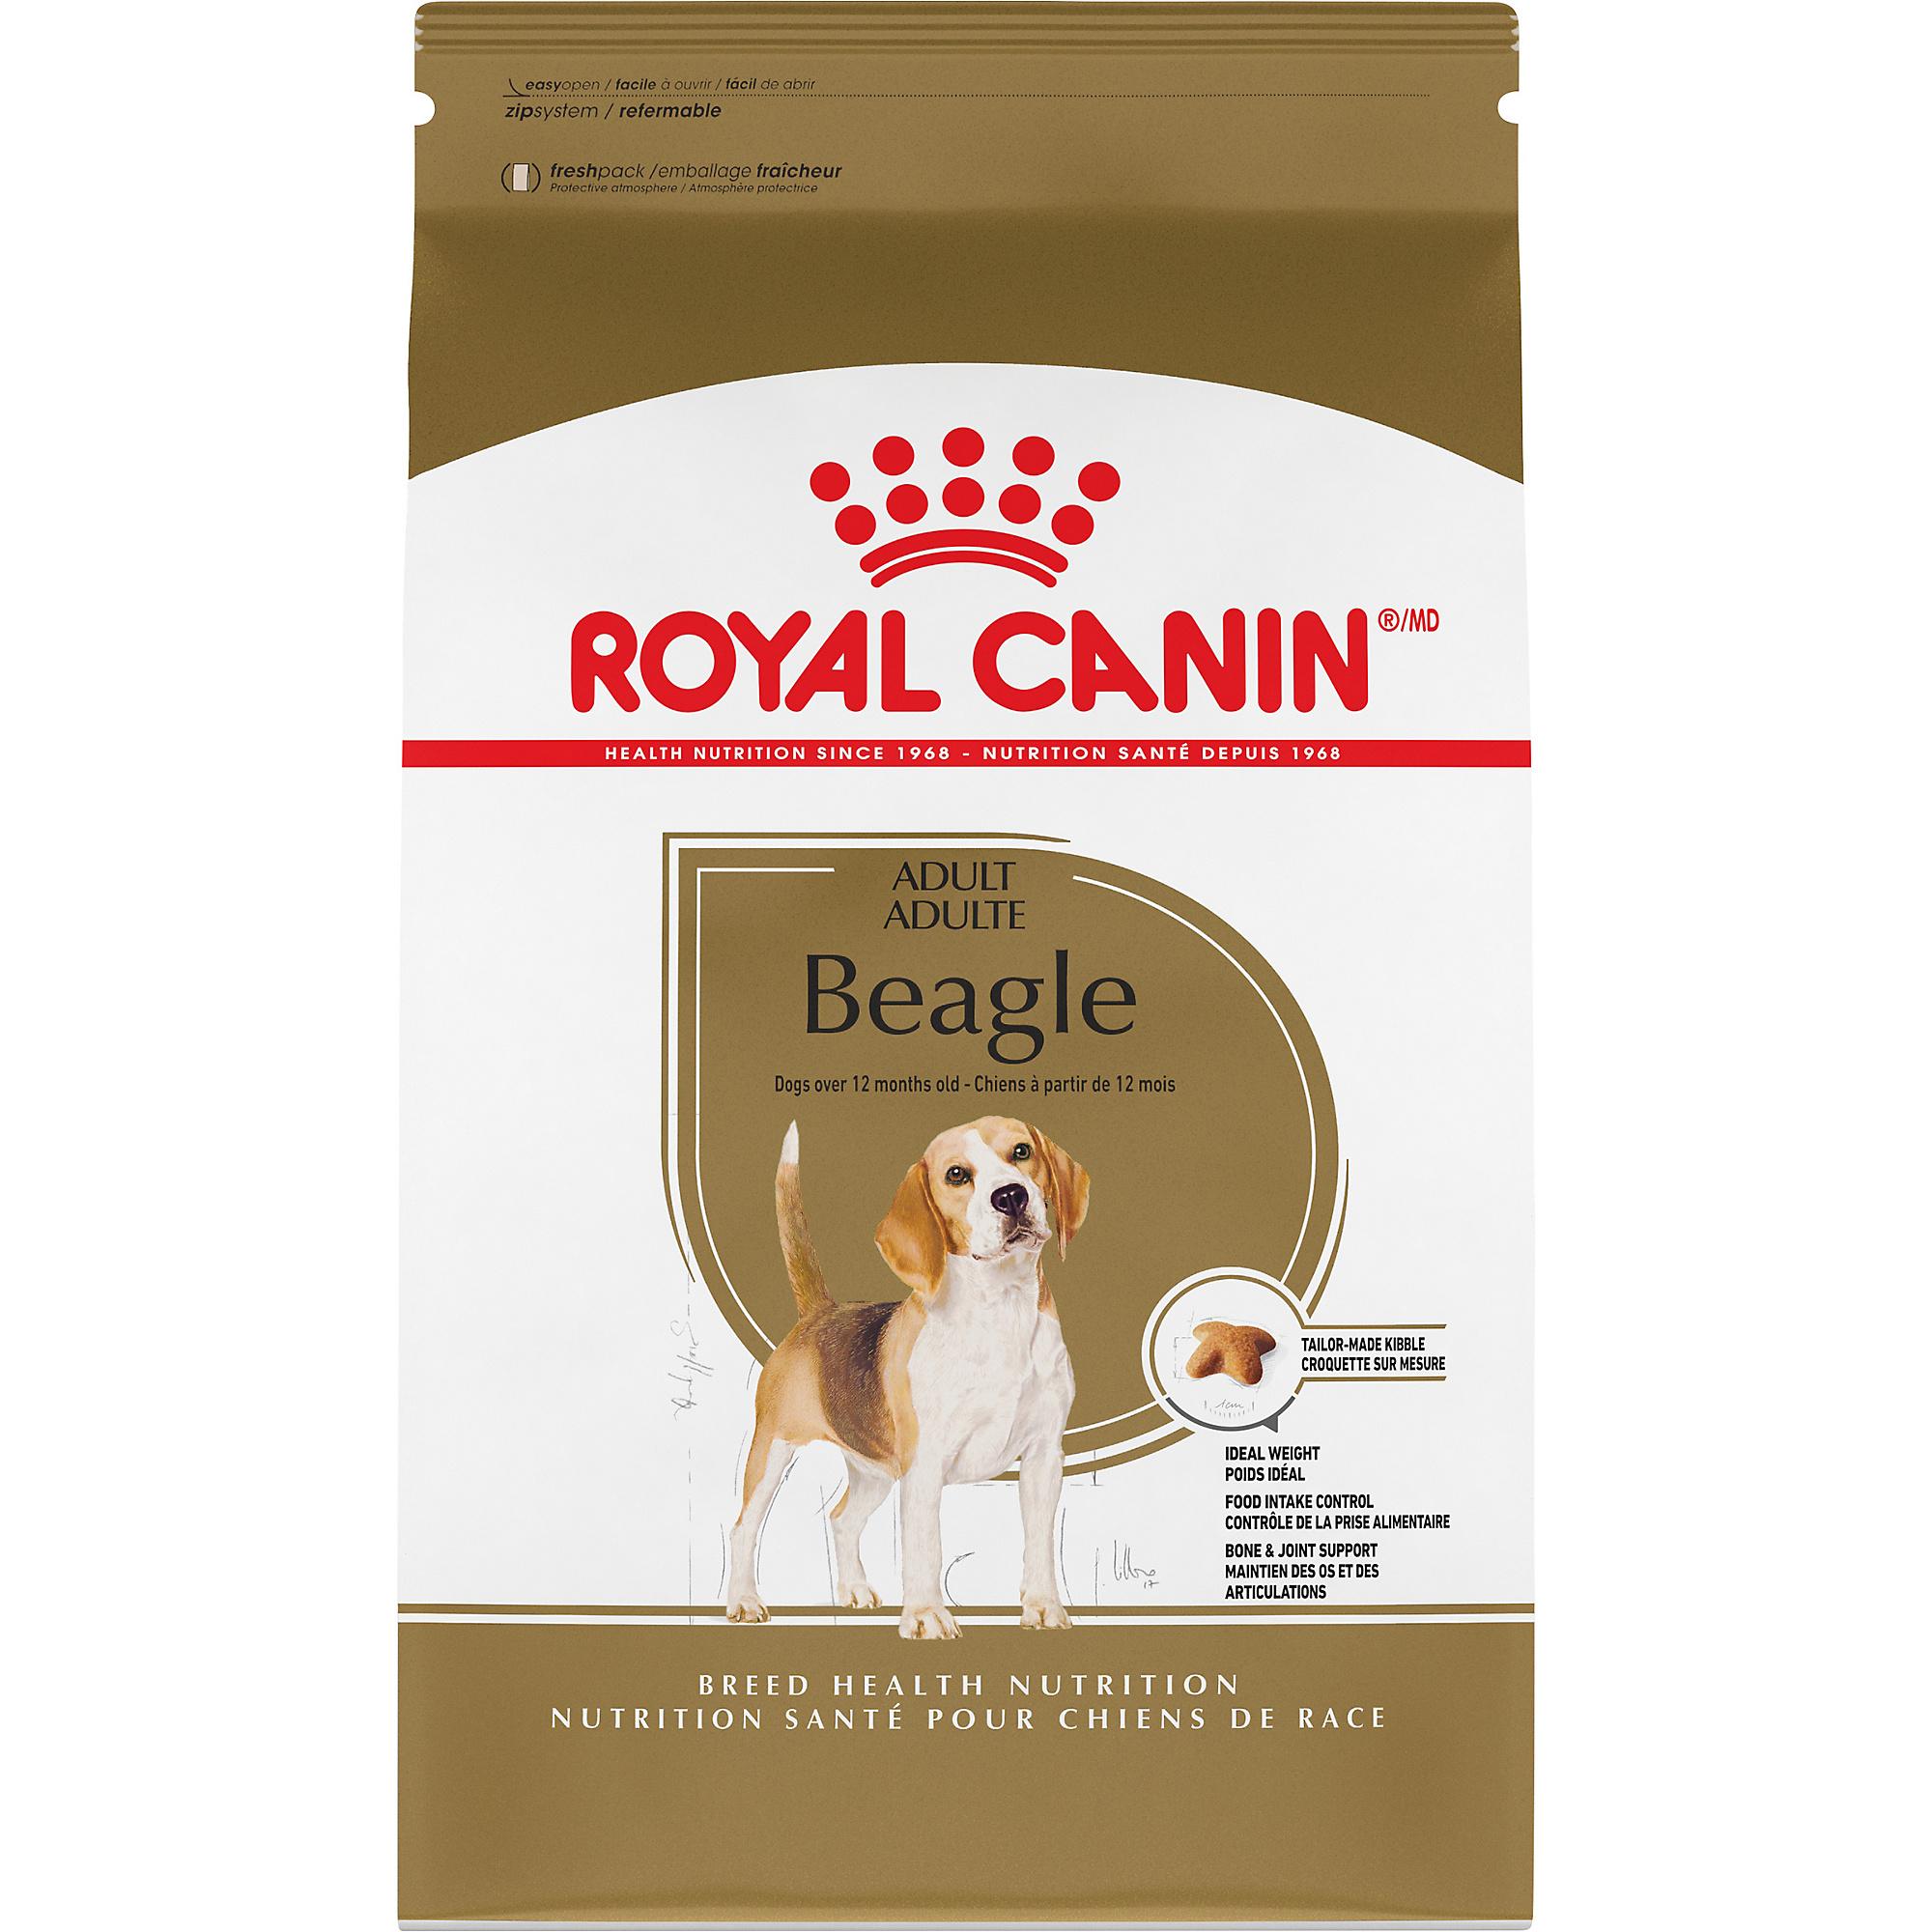 Royal Canin Breed Health Nutrition Beagle Adult Dry Dog Food Image